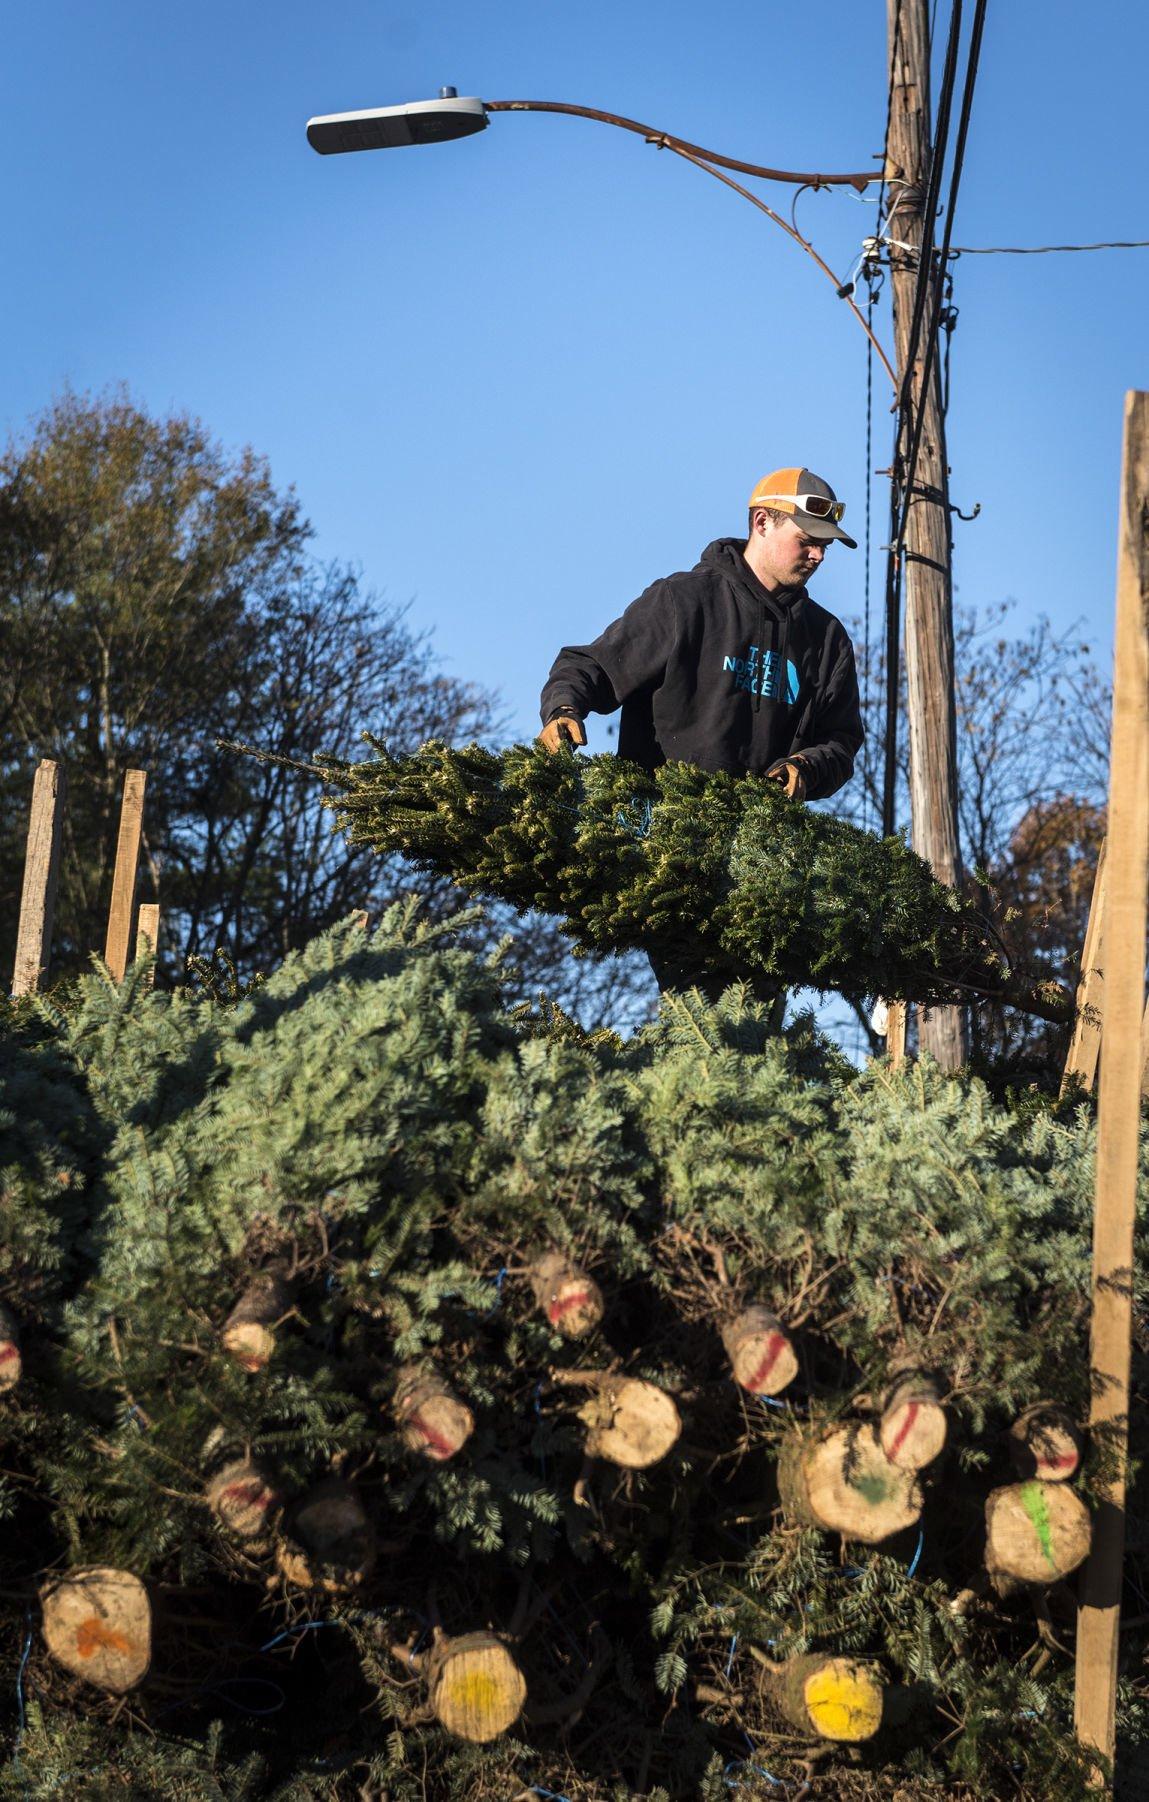 s Christmas preparations at the Mockwood Christmas Tree Lot